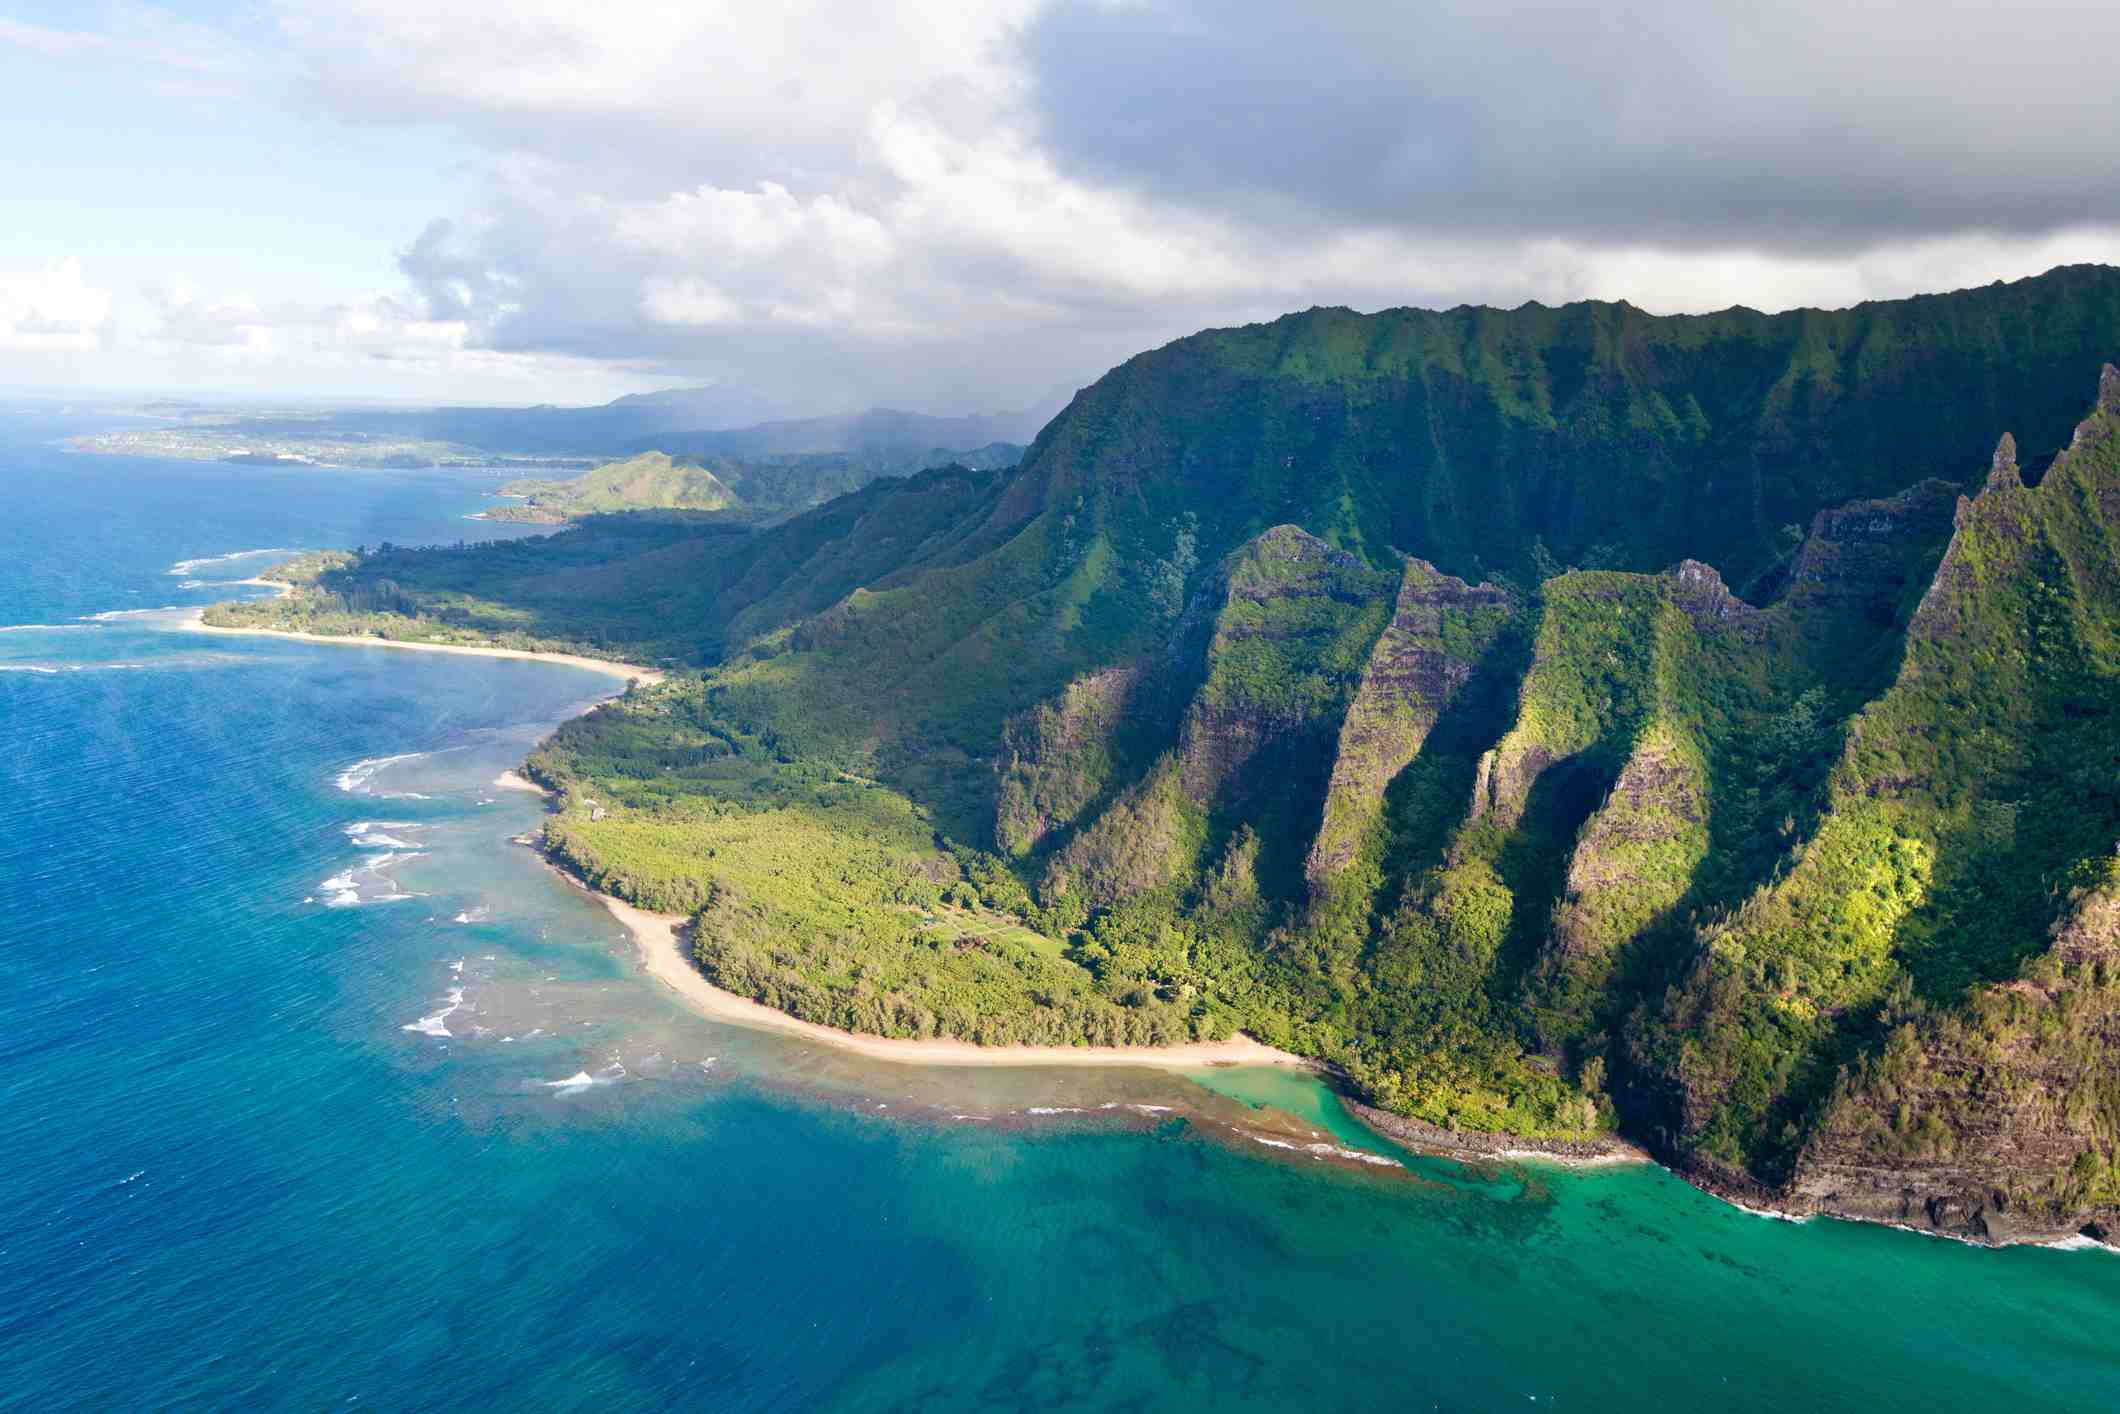 Vista aérea de Kauai Hawaii